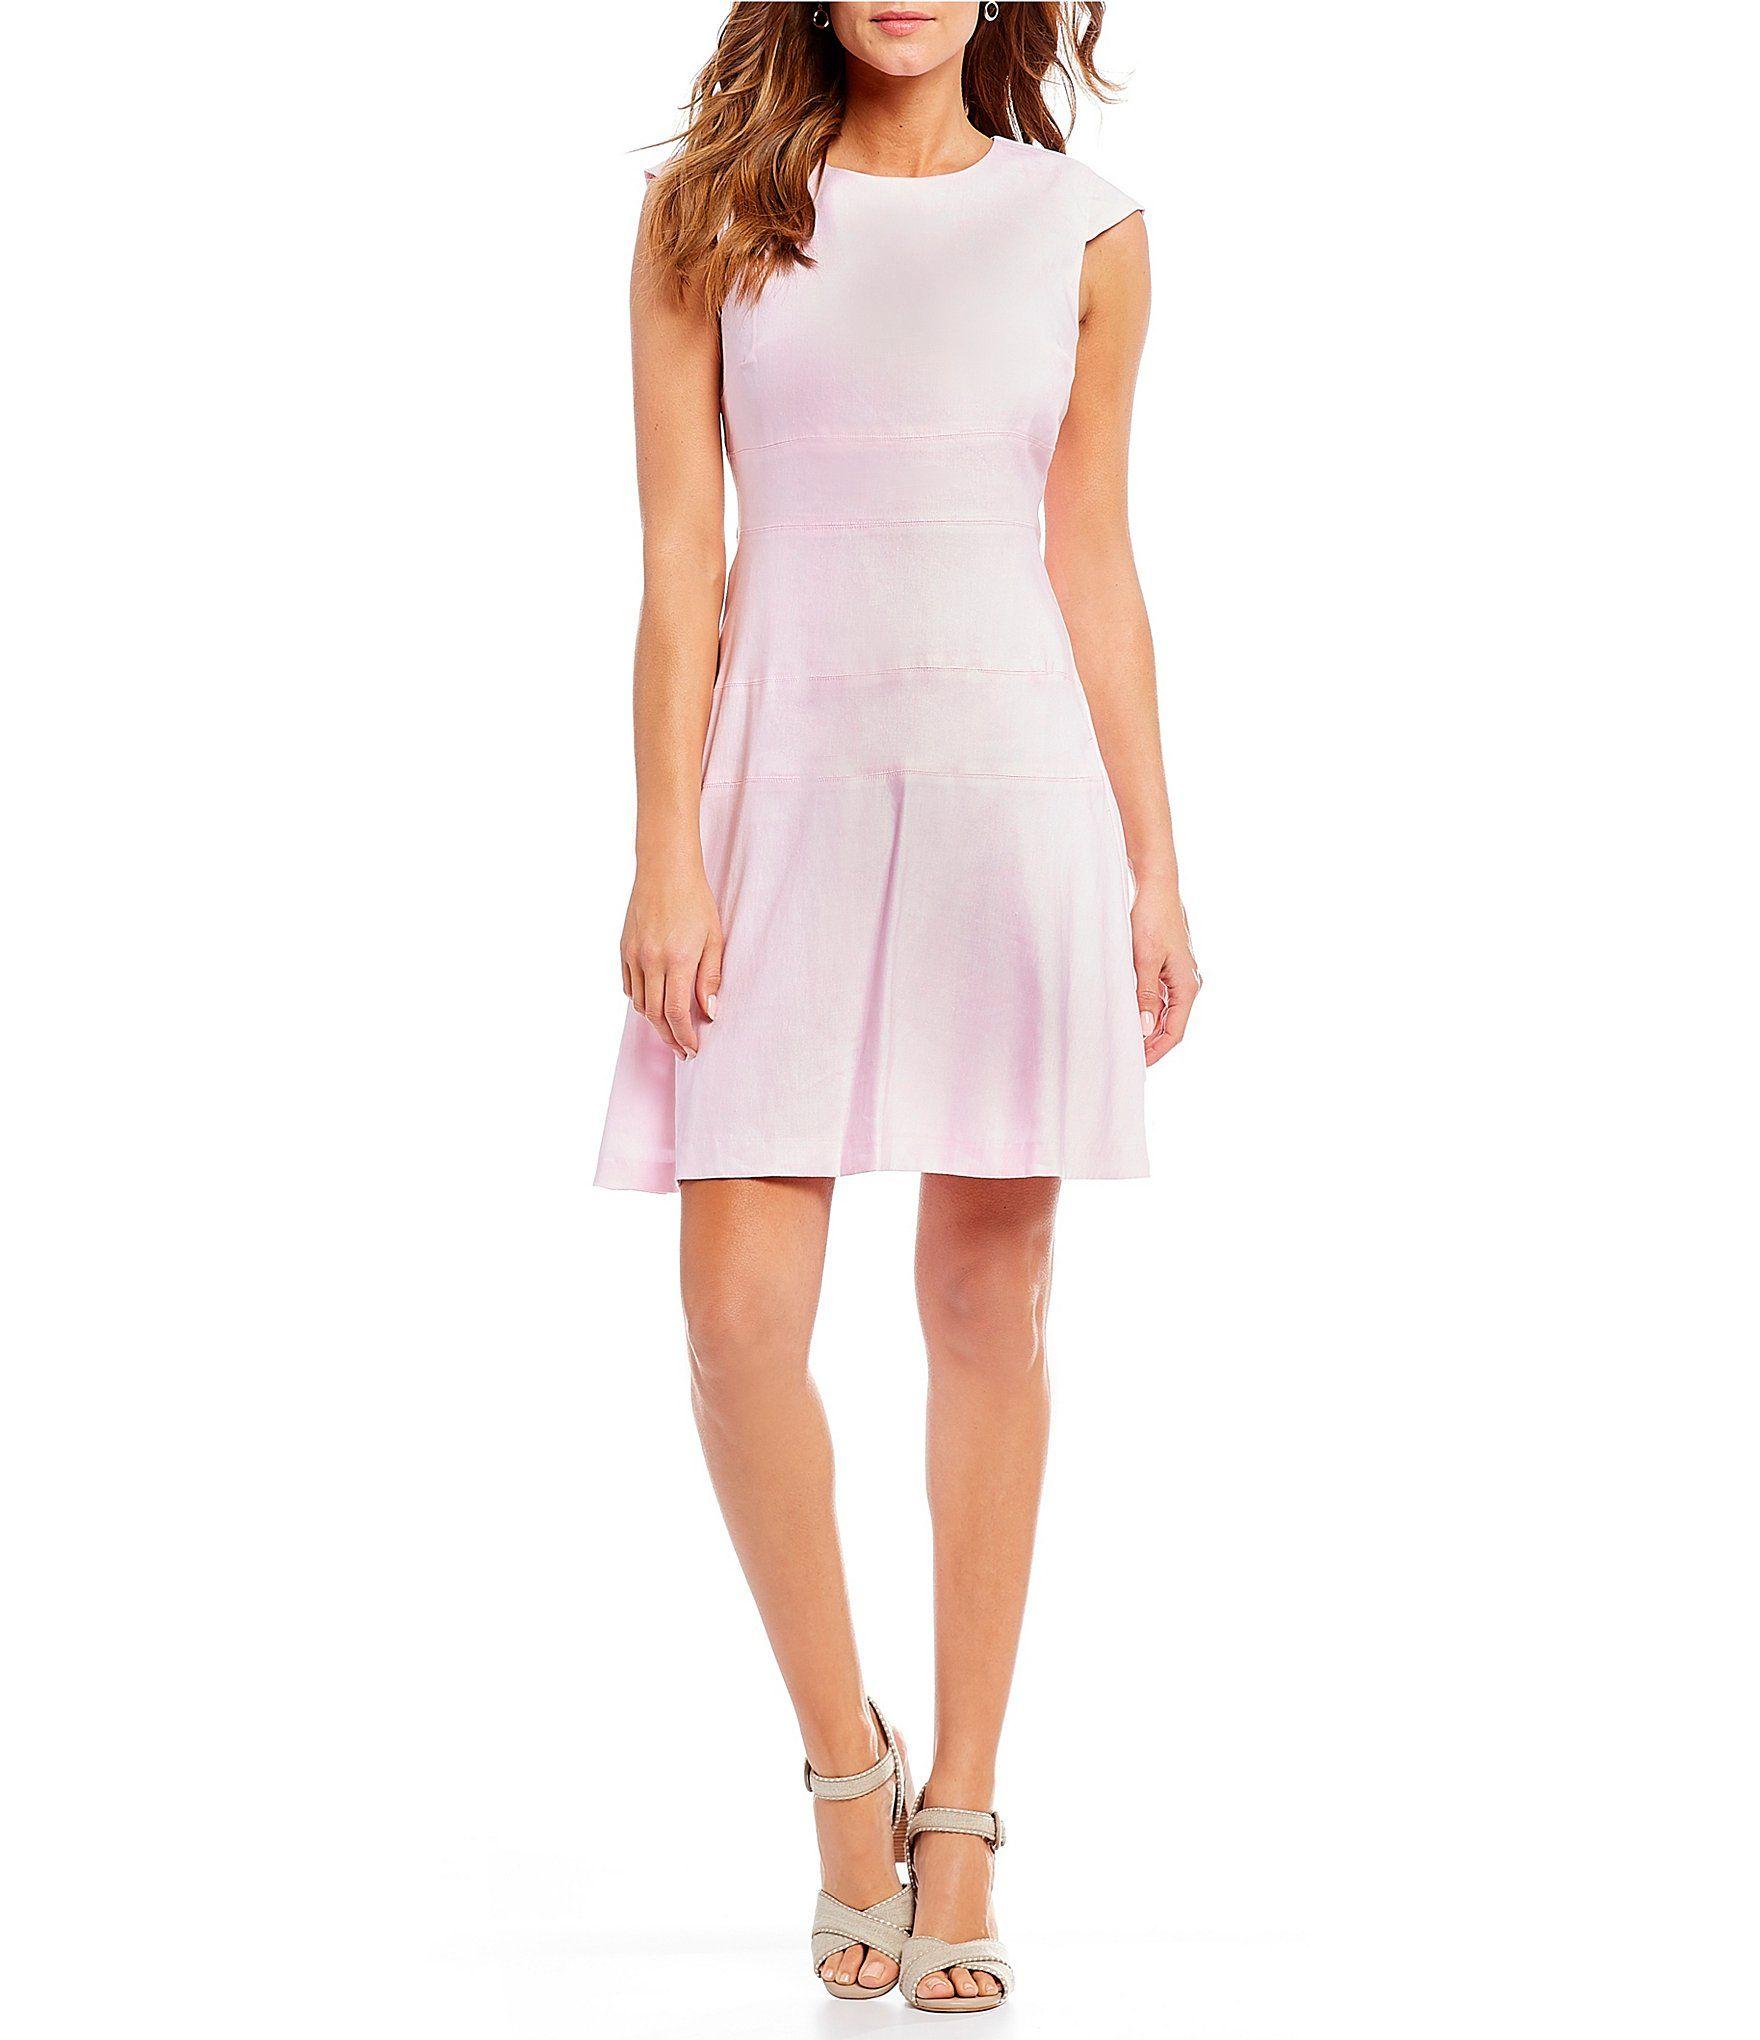 Dillard's Summer Dresses